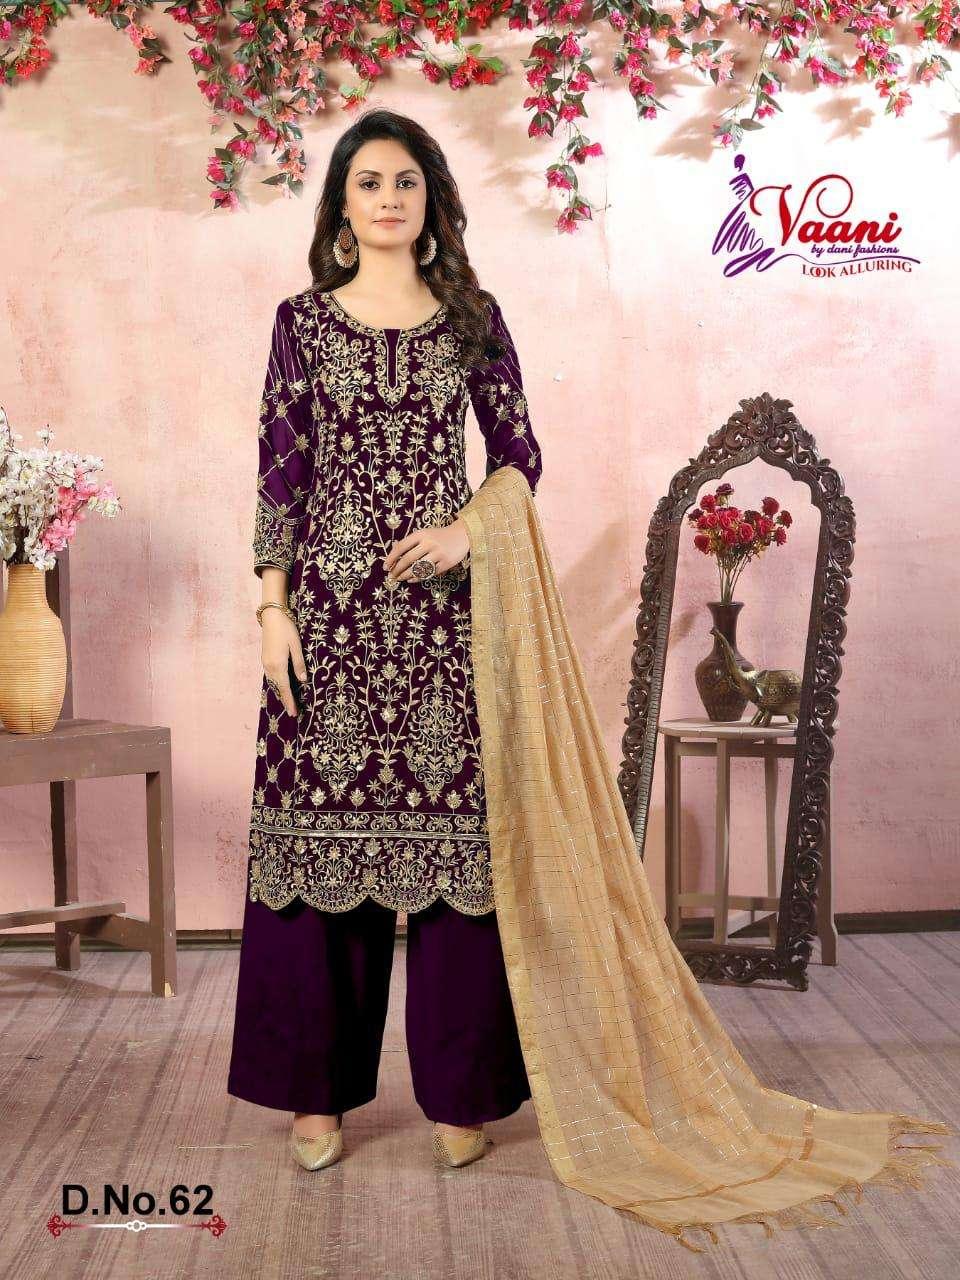 dani fashions vaani vol 6 georgette salwar suits catalog at best rates on krishna creation